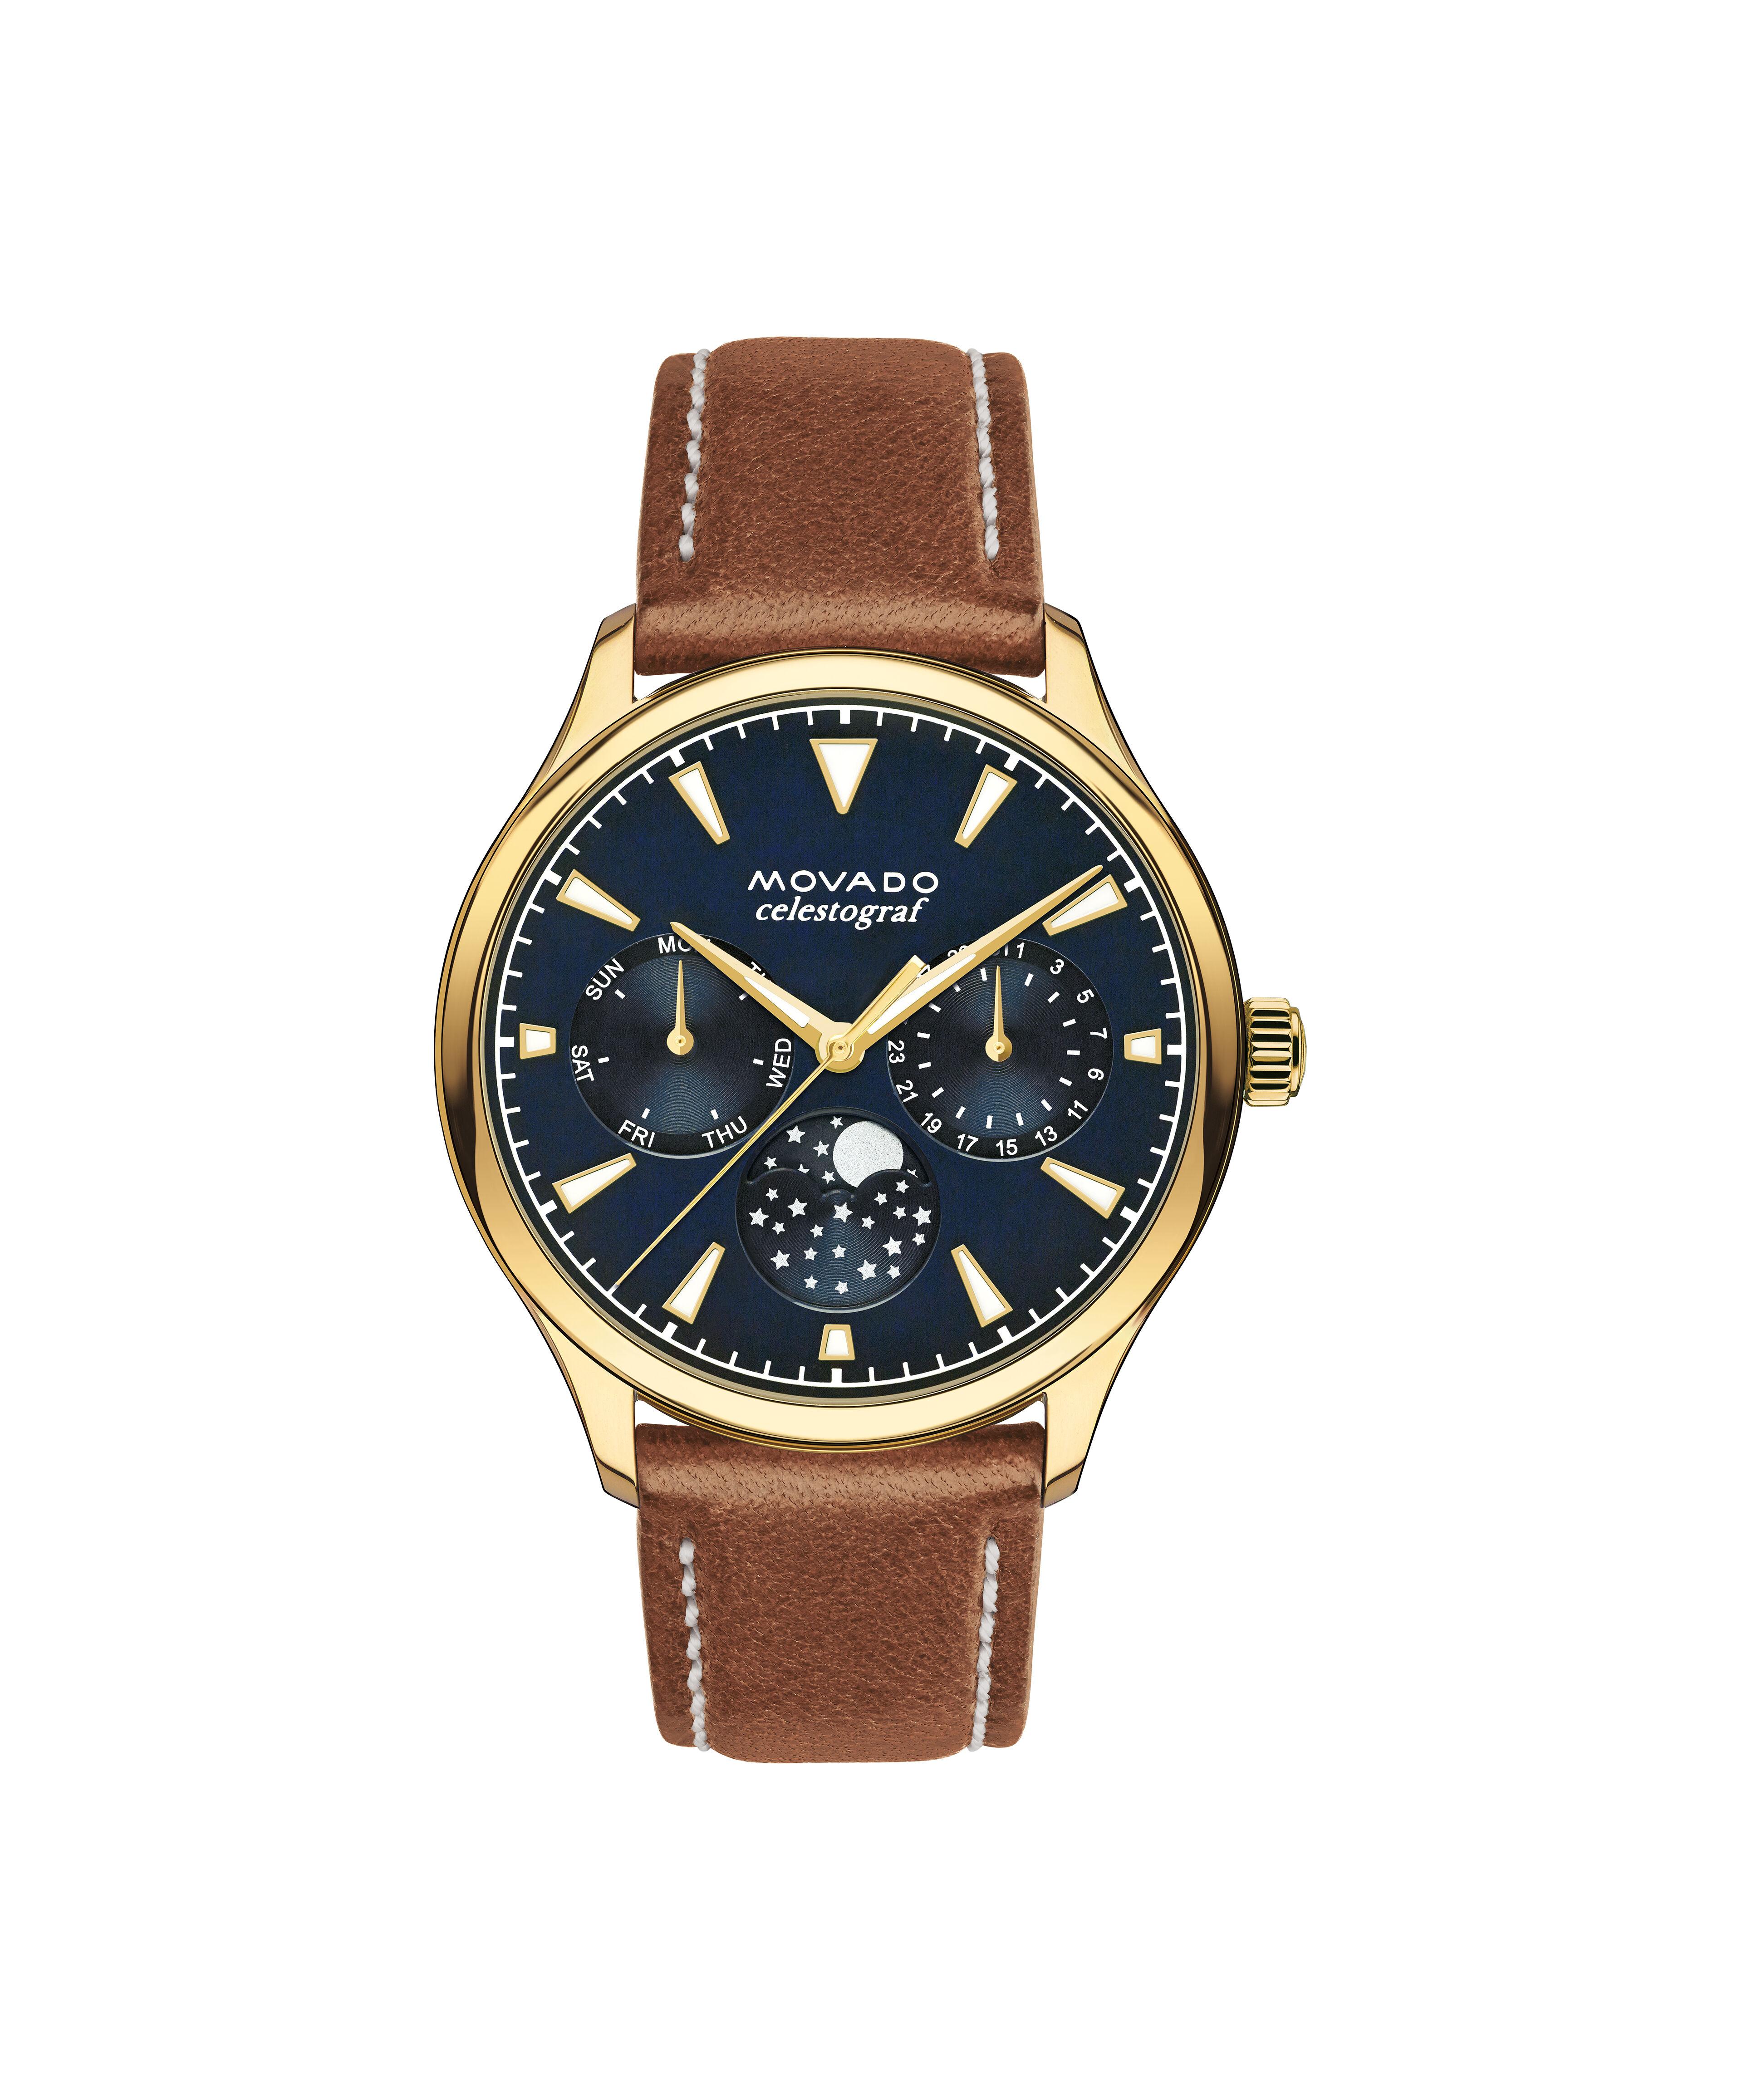 Amazon Selling Fake Watches